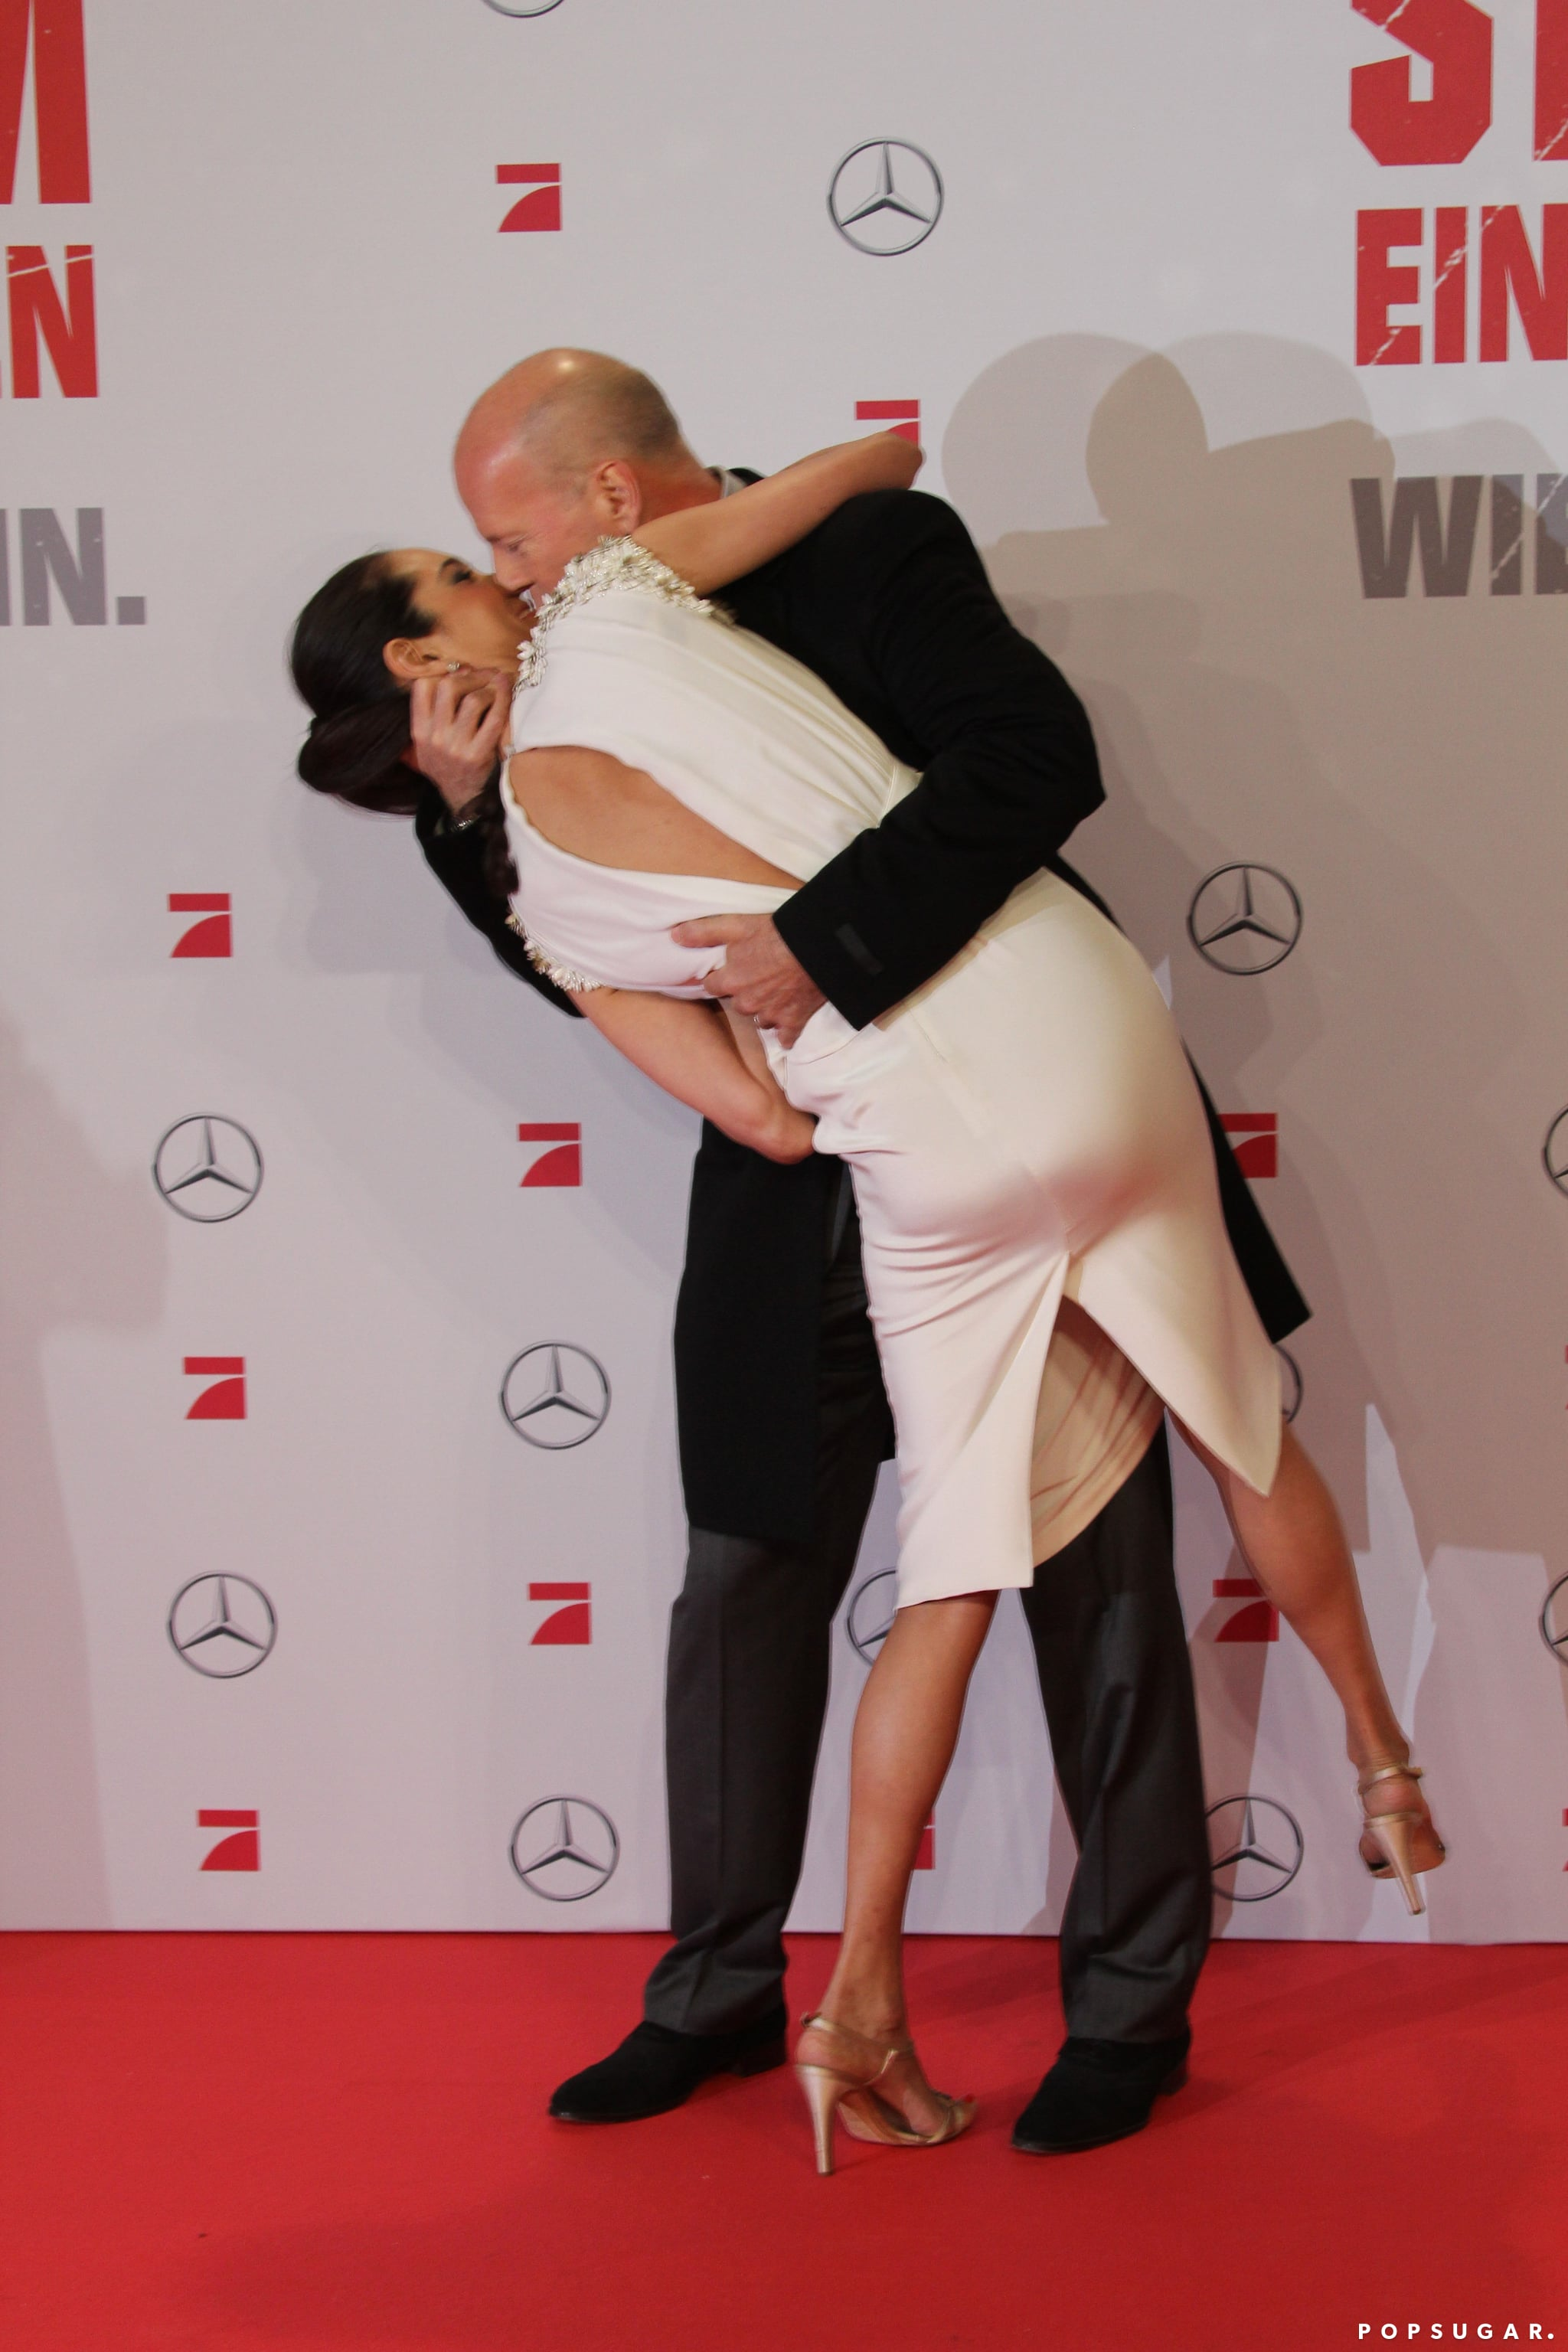 Bruce Willis swept Emma Heming off her feet in Germany in February 2013.